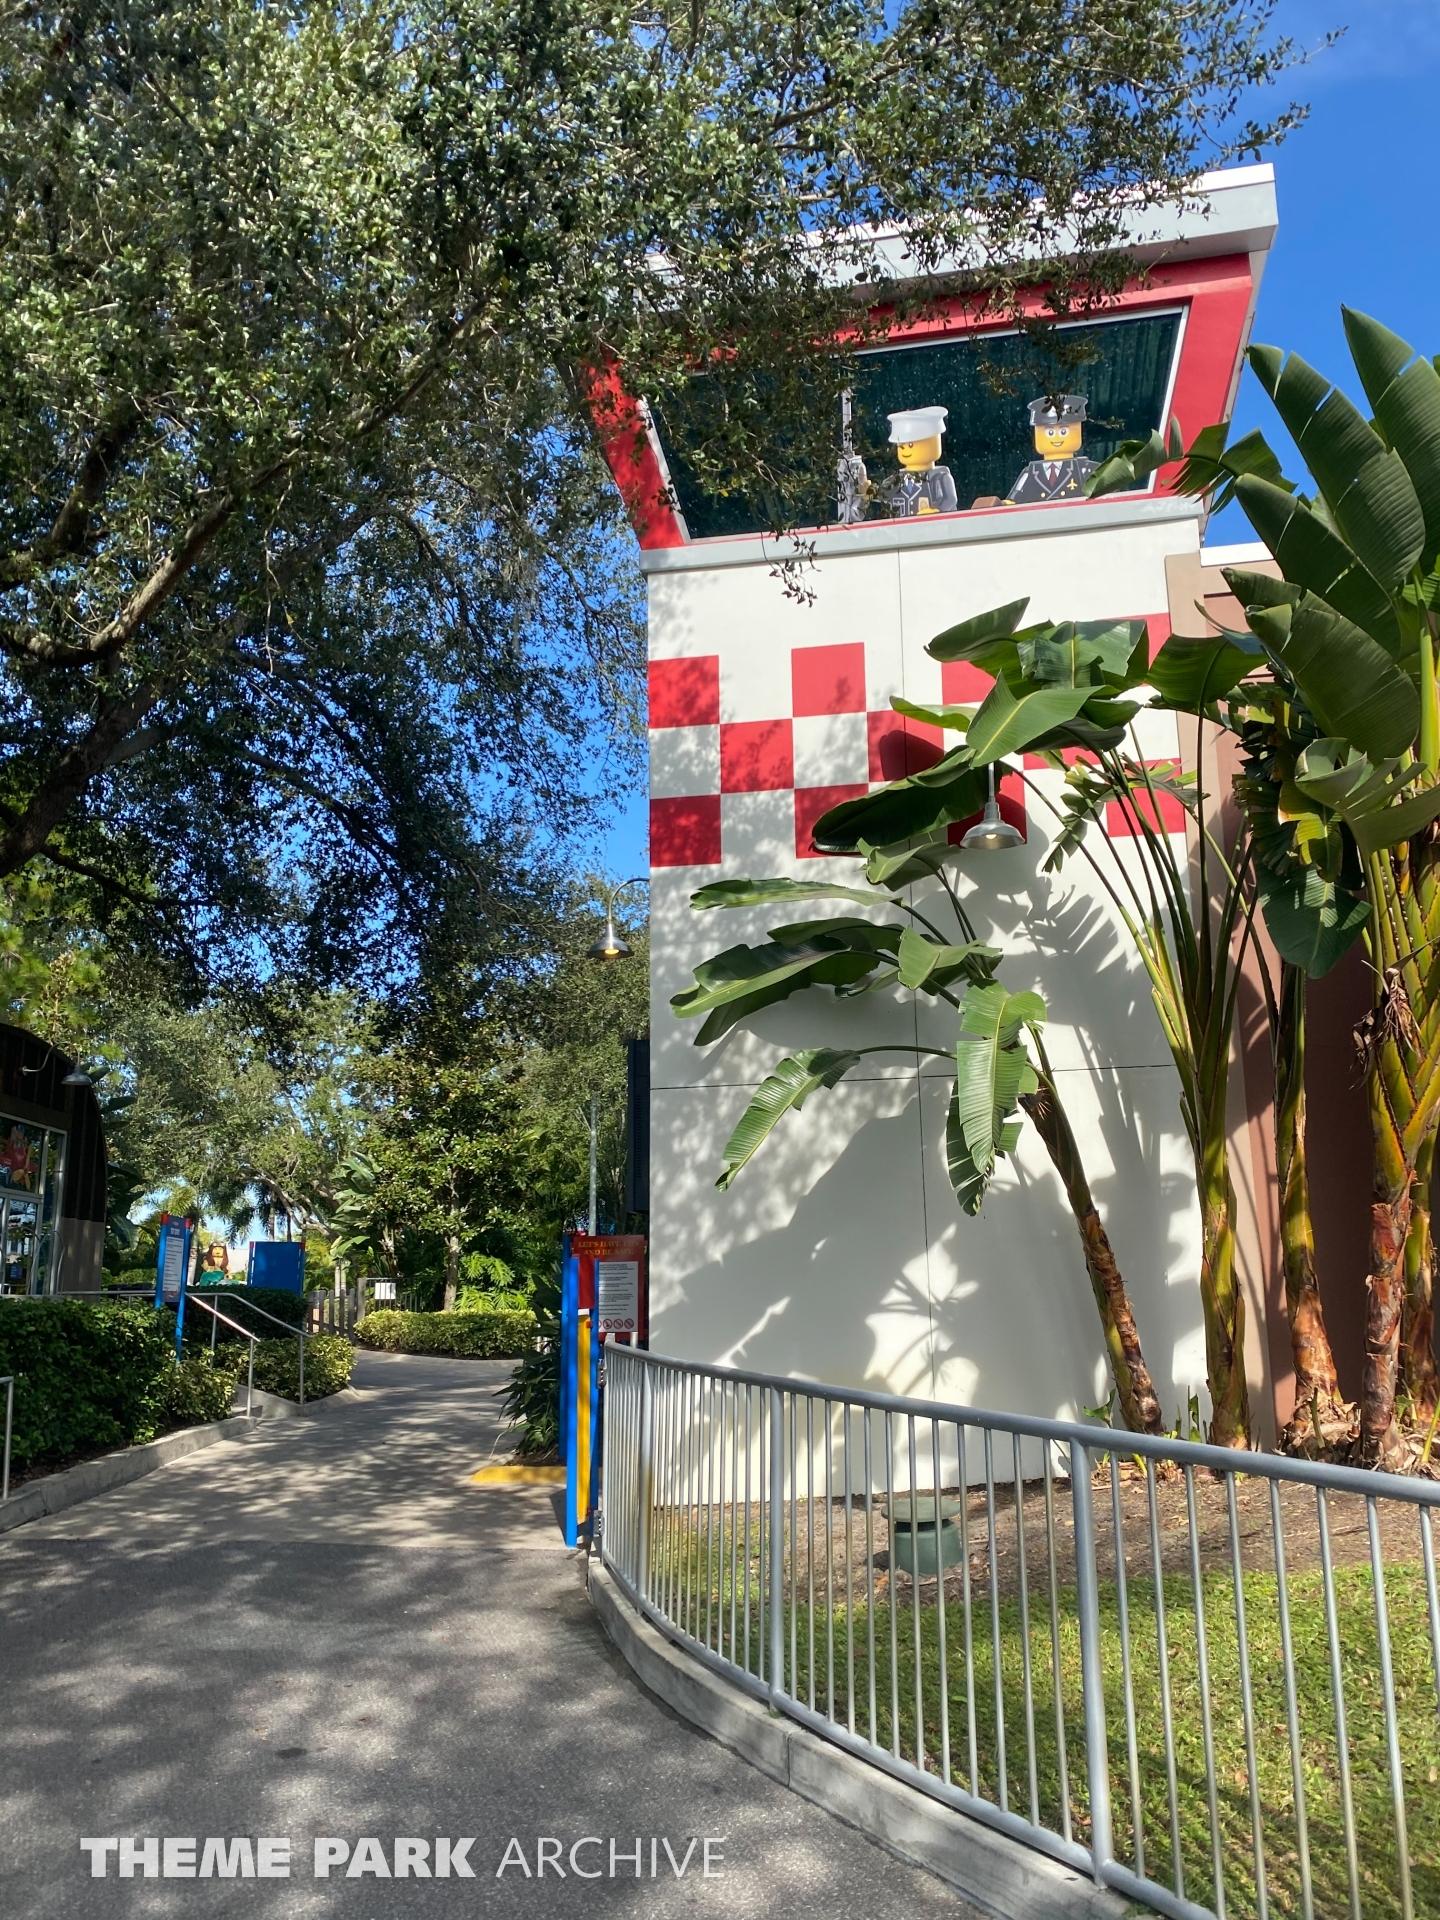 Flying School at LEGOLAND Florida